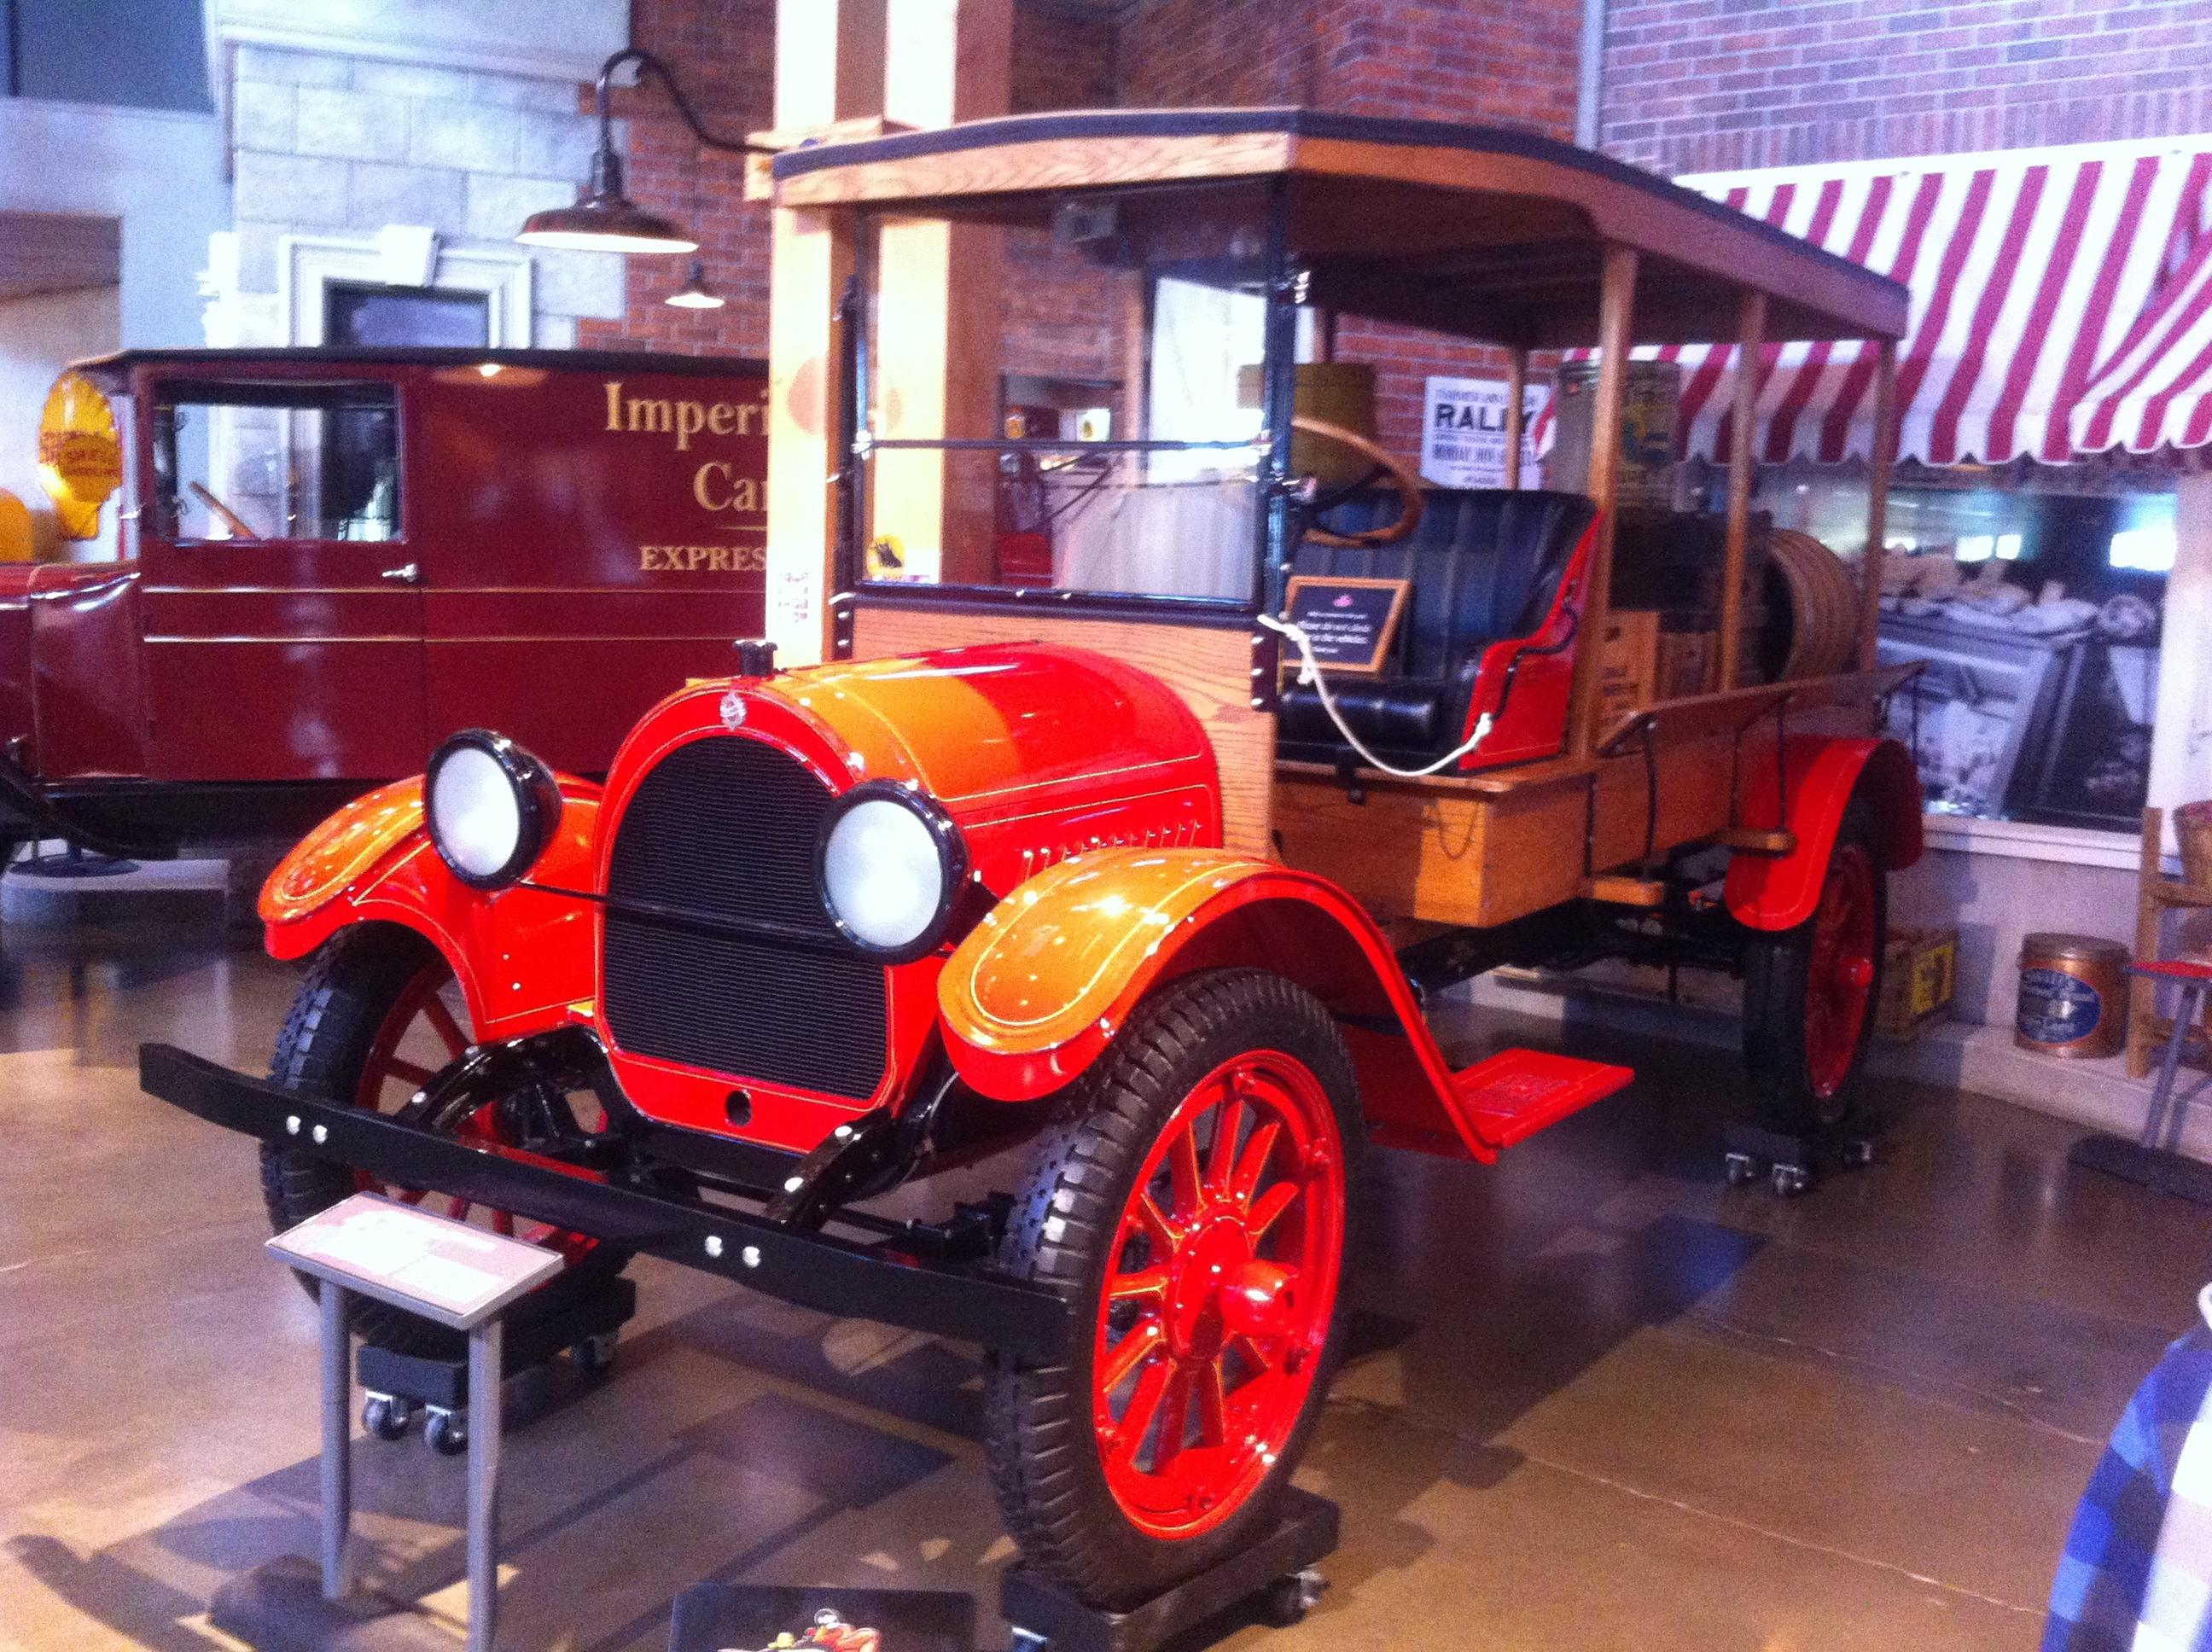 File:1919 Oldsmobile truck (7639935358) jpg - Wikimedia Commons